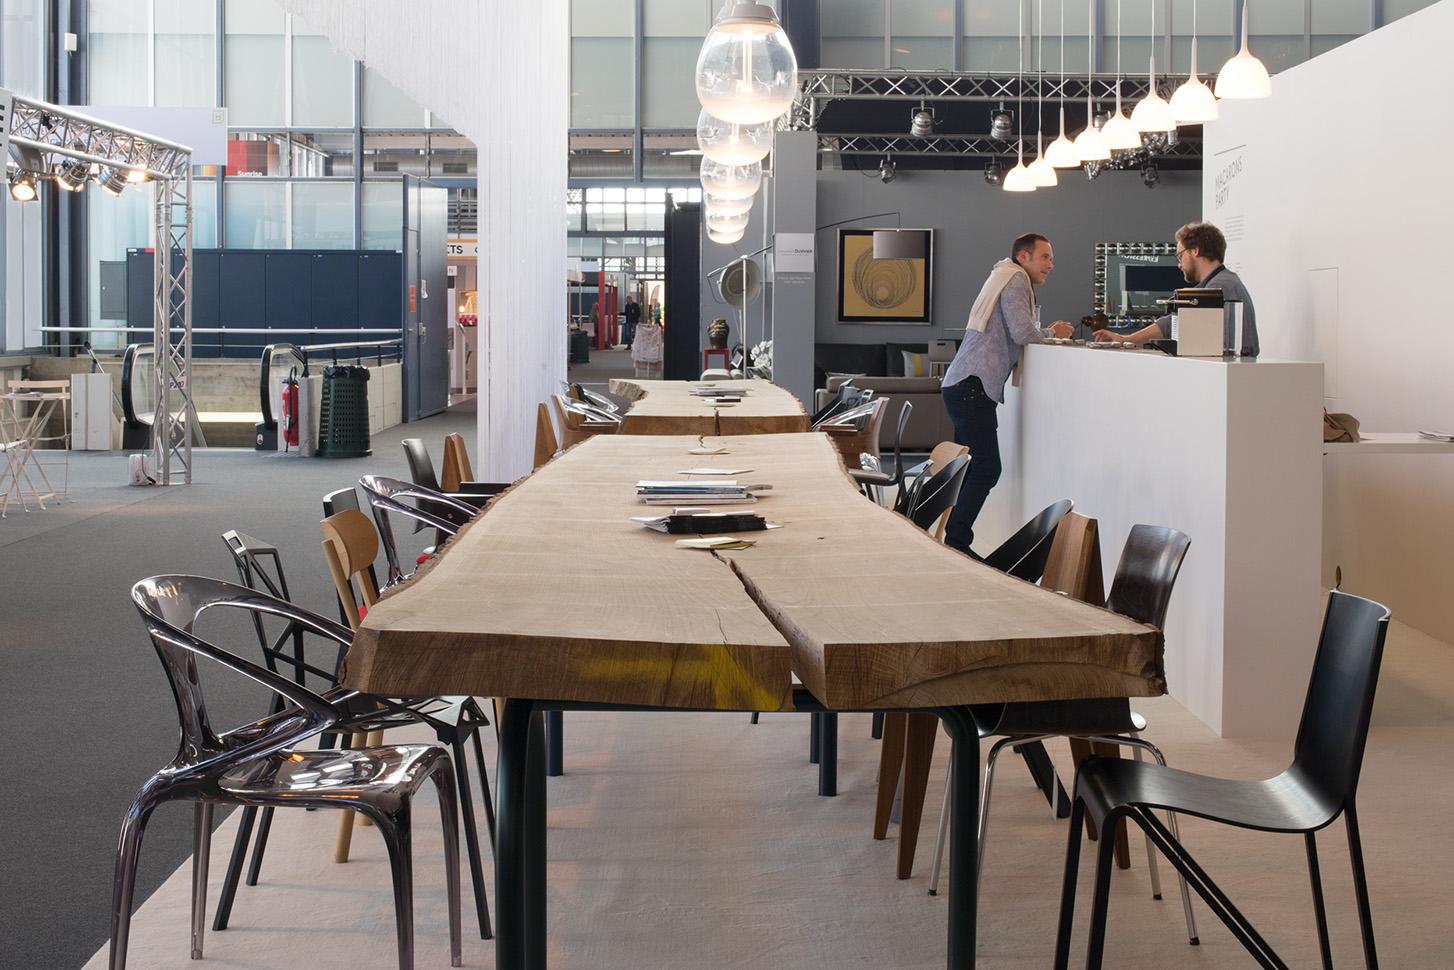 Habitat - Jardin 2015, Beaulieu Lausanne  Scenography Design Studio Renens